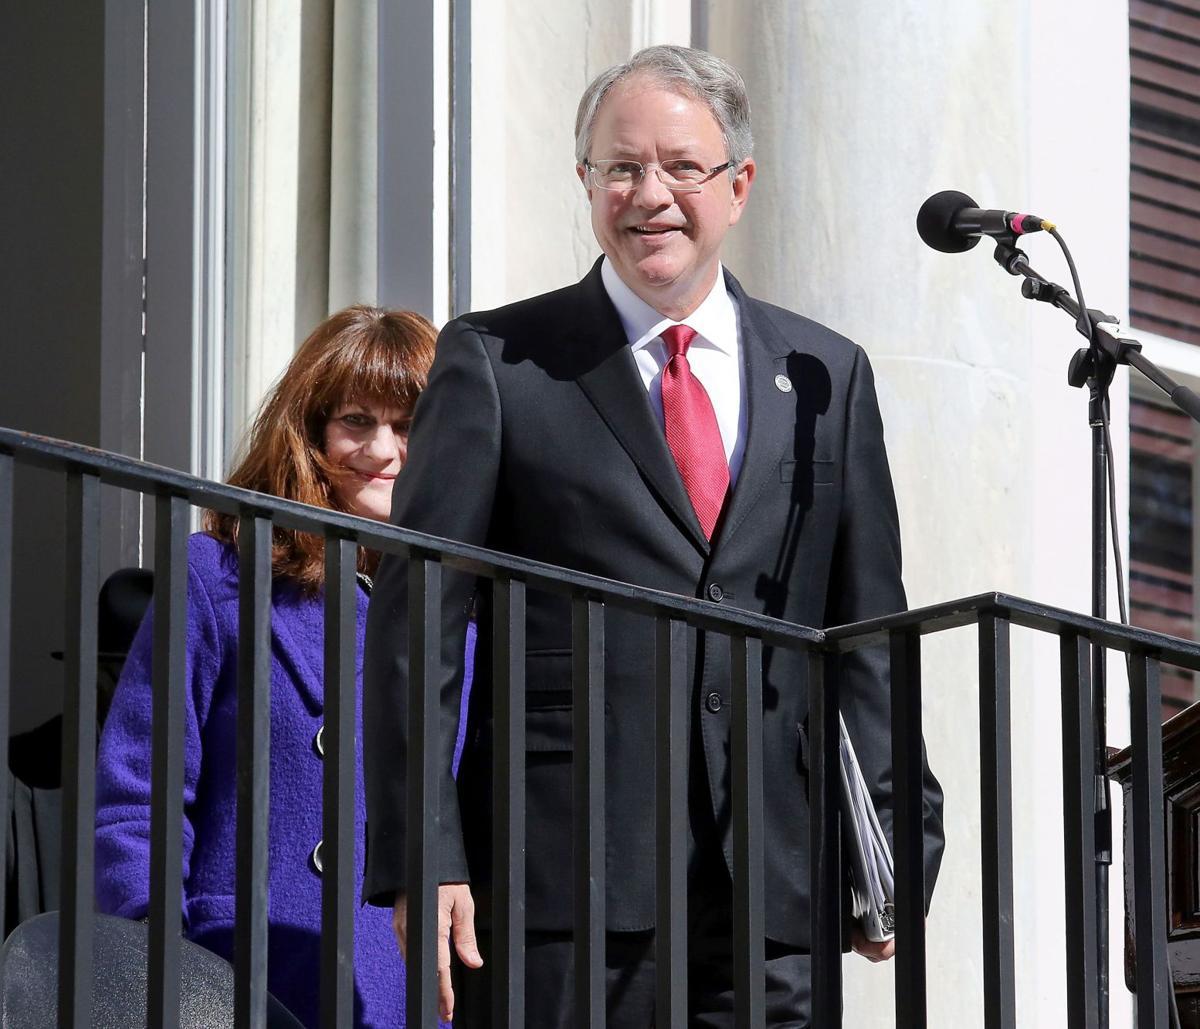 Mayor Tecklenburg won't be endorsing in presidential race